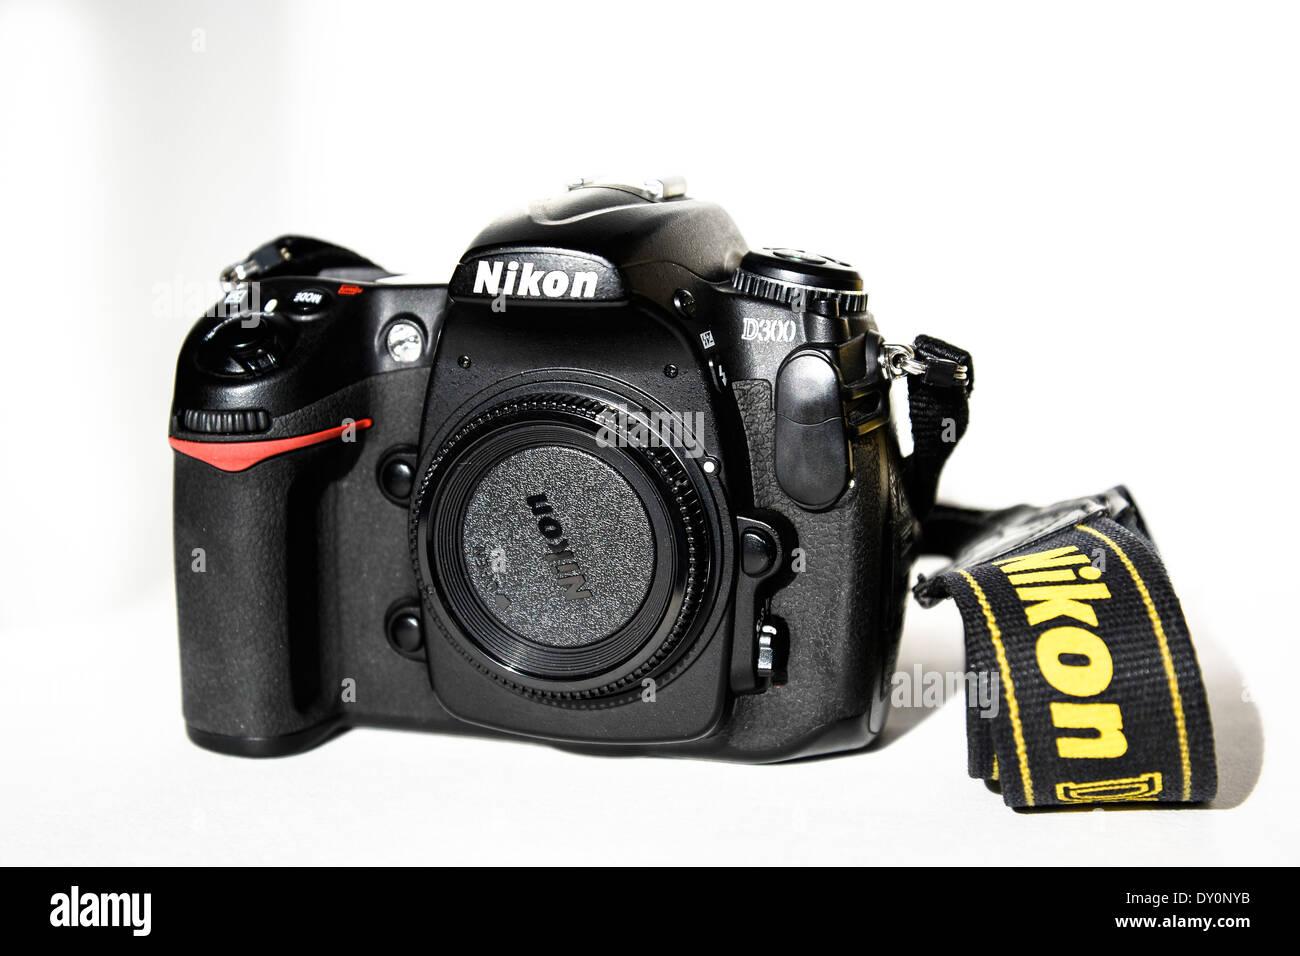 Nikon D300 DSLR camera body - Stock Image